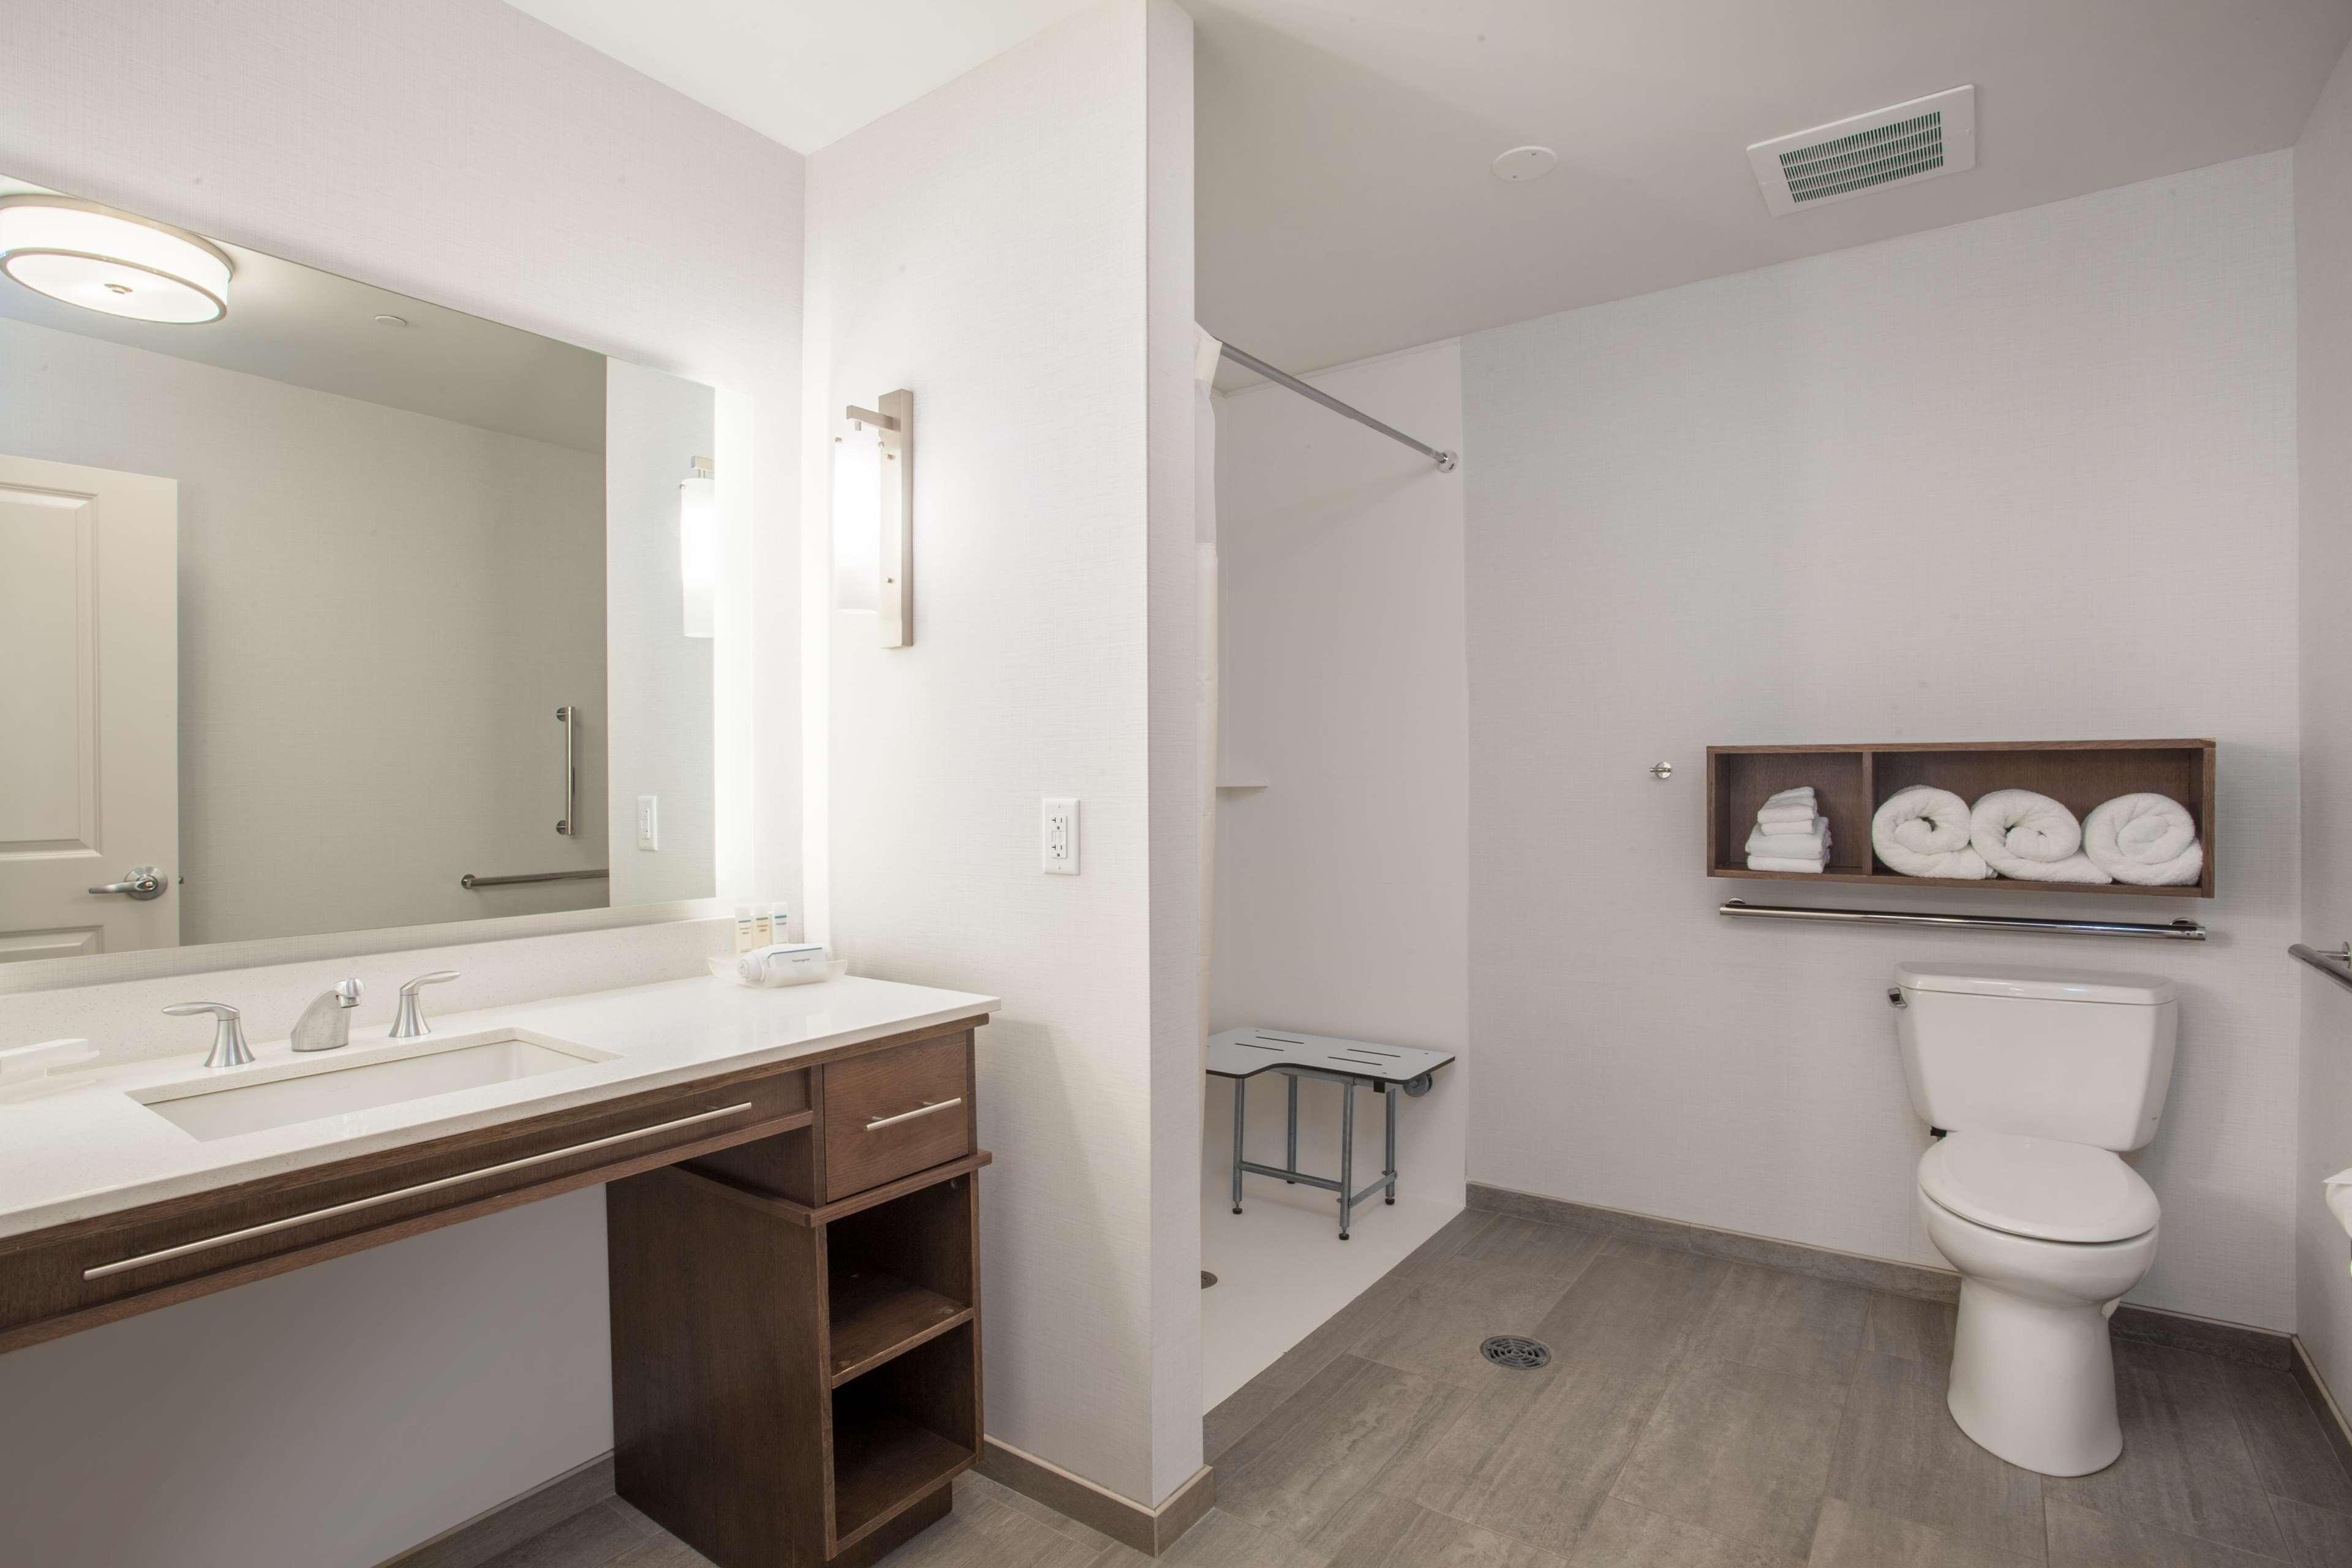 Homewood Suites by Hilton Saratoga Springs image 39